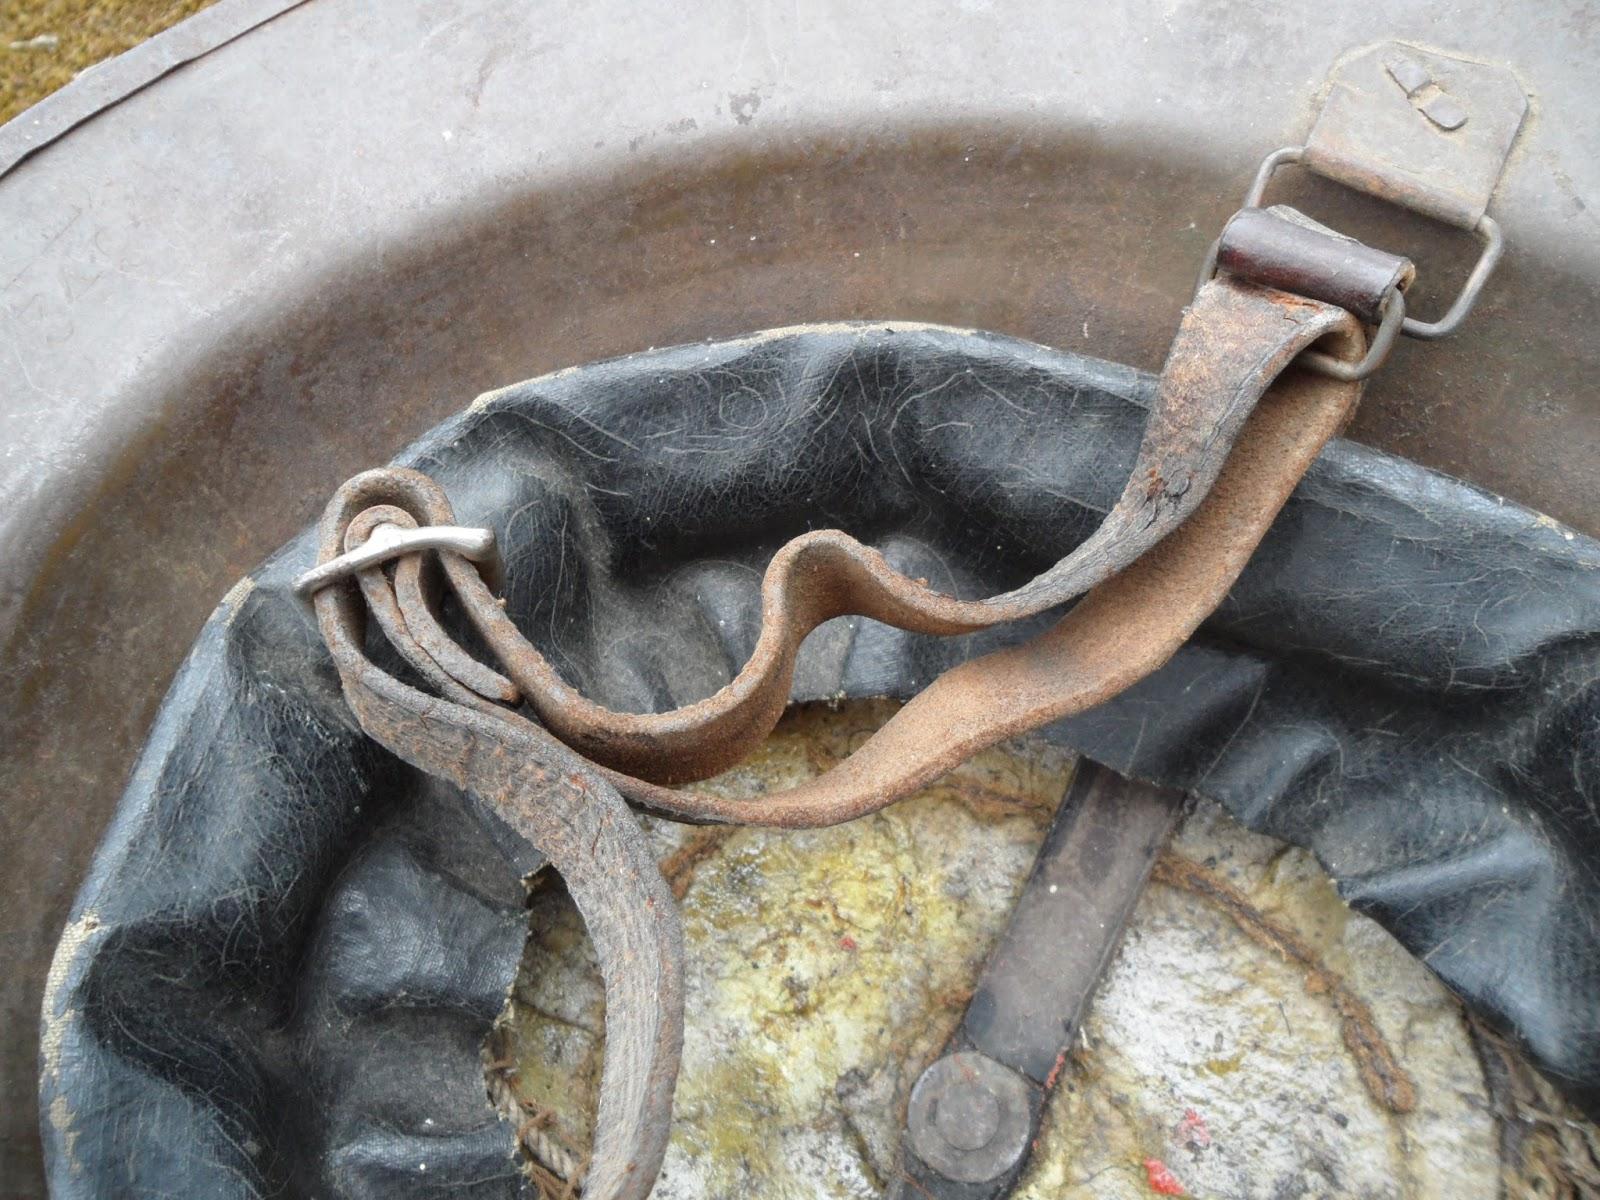 Four Bees: British Brodie Helmet MkI, WW1, manufactured between 1916